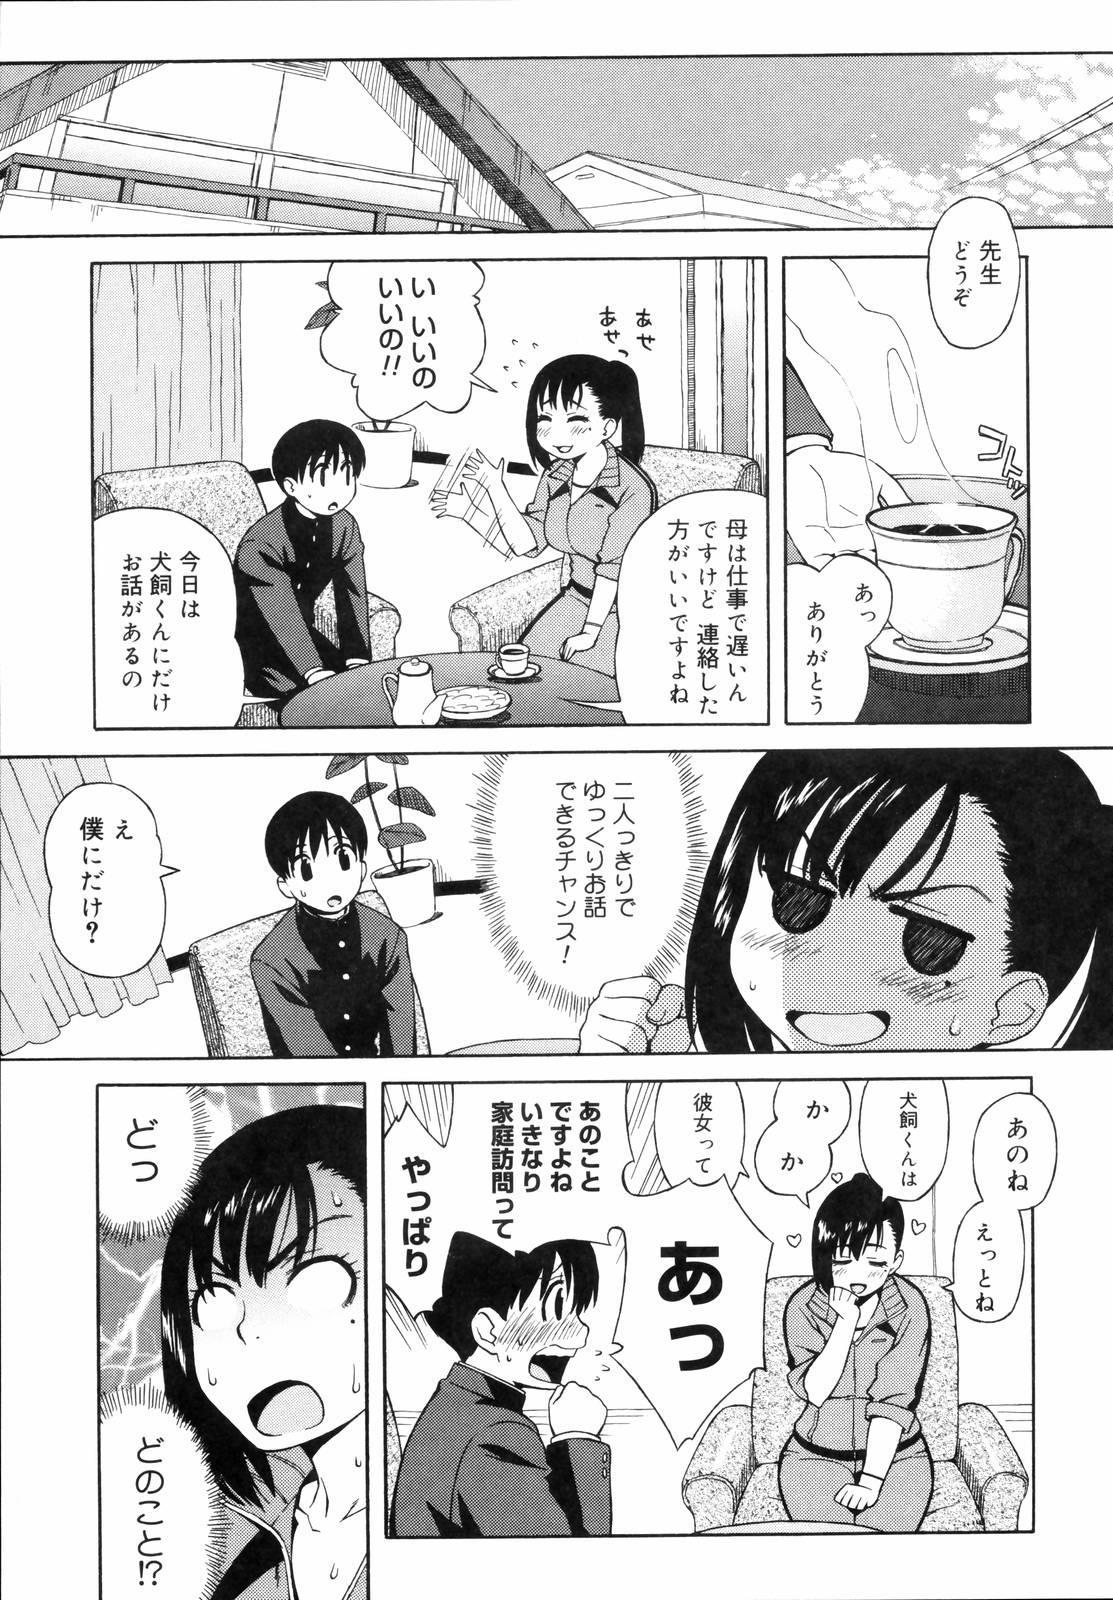 Shishunki wa Hatsujouki - Adolescence is a sexual excitement period. 112